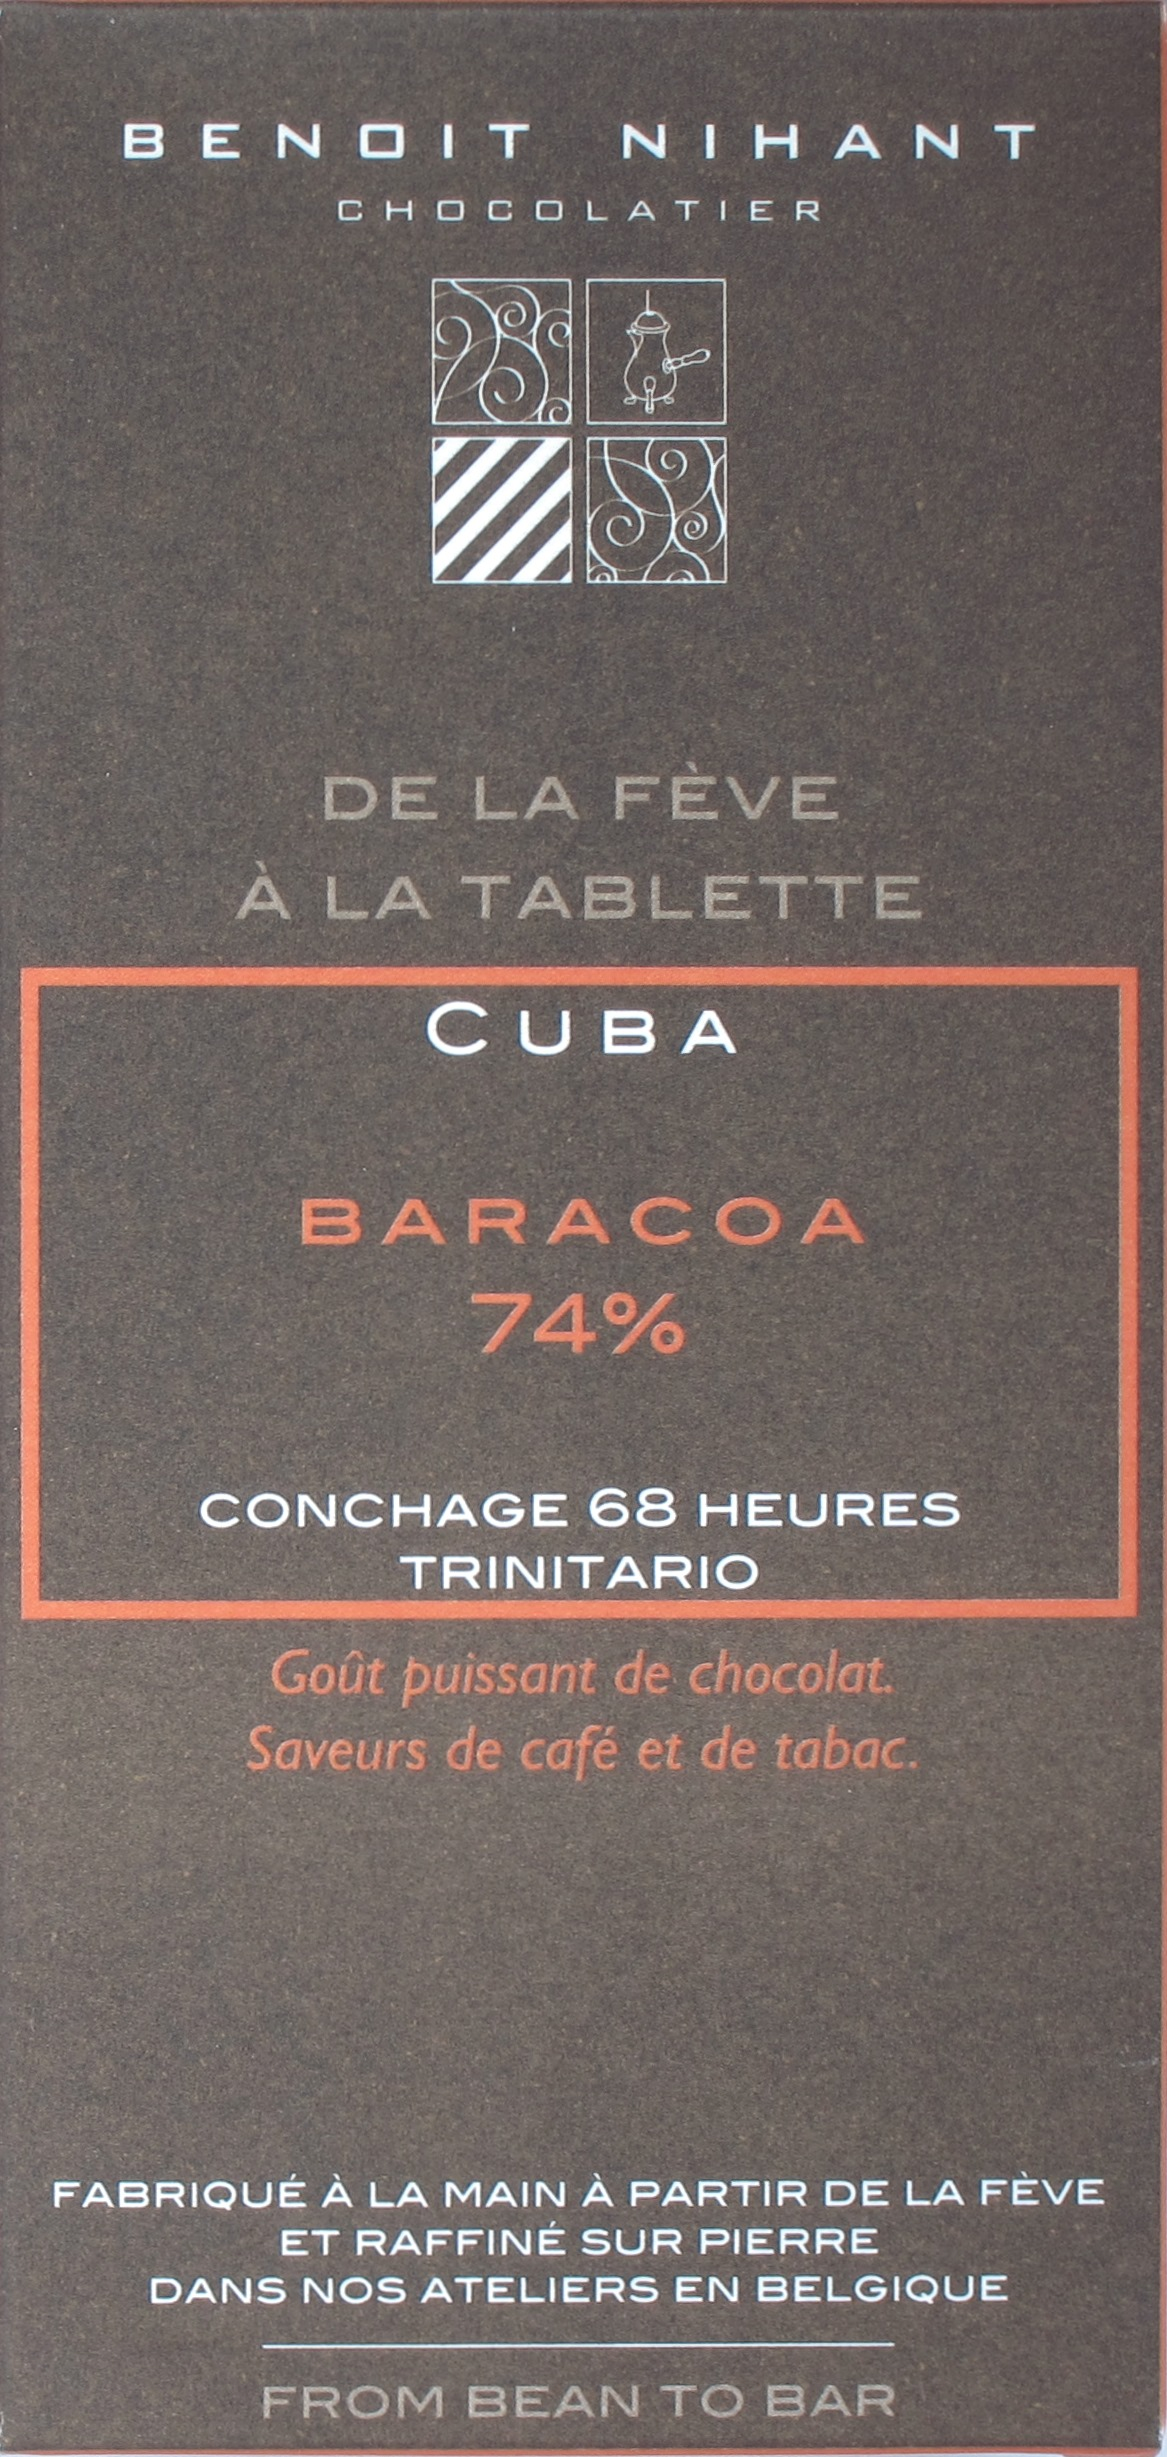 Benoit Nihant Bitterschokolade Cuba 74%, Vorderseite